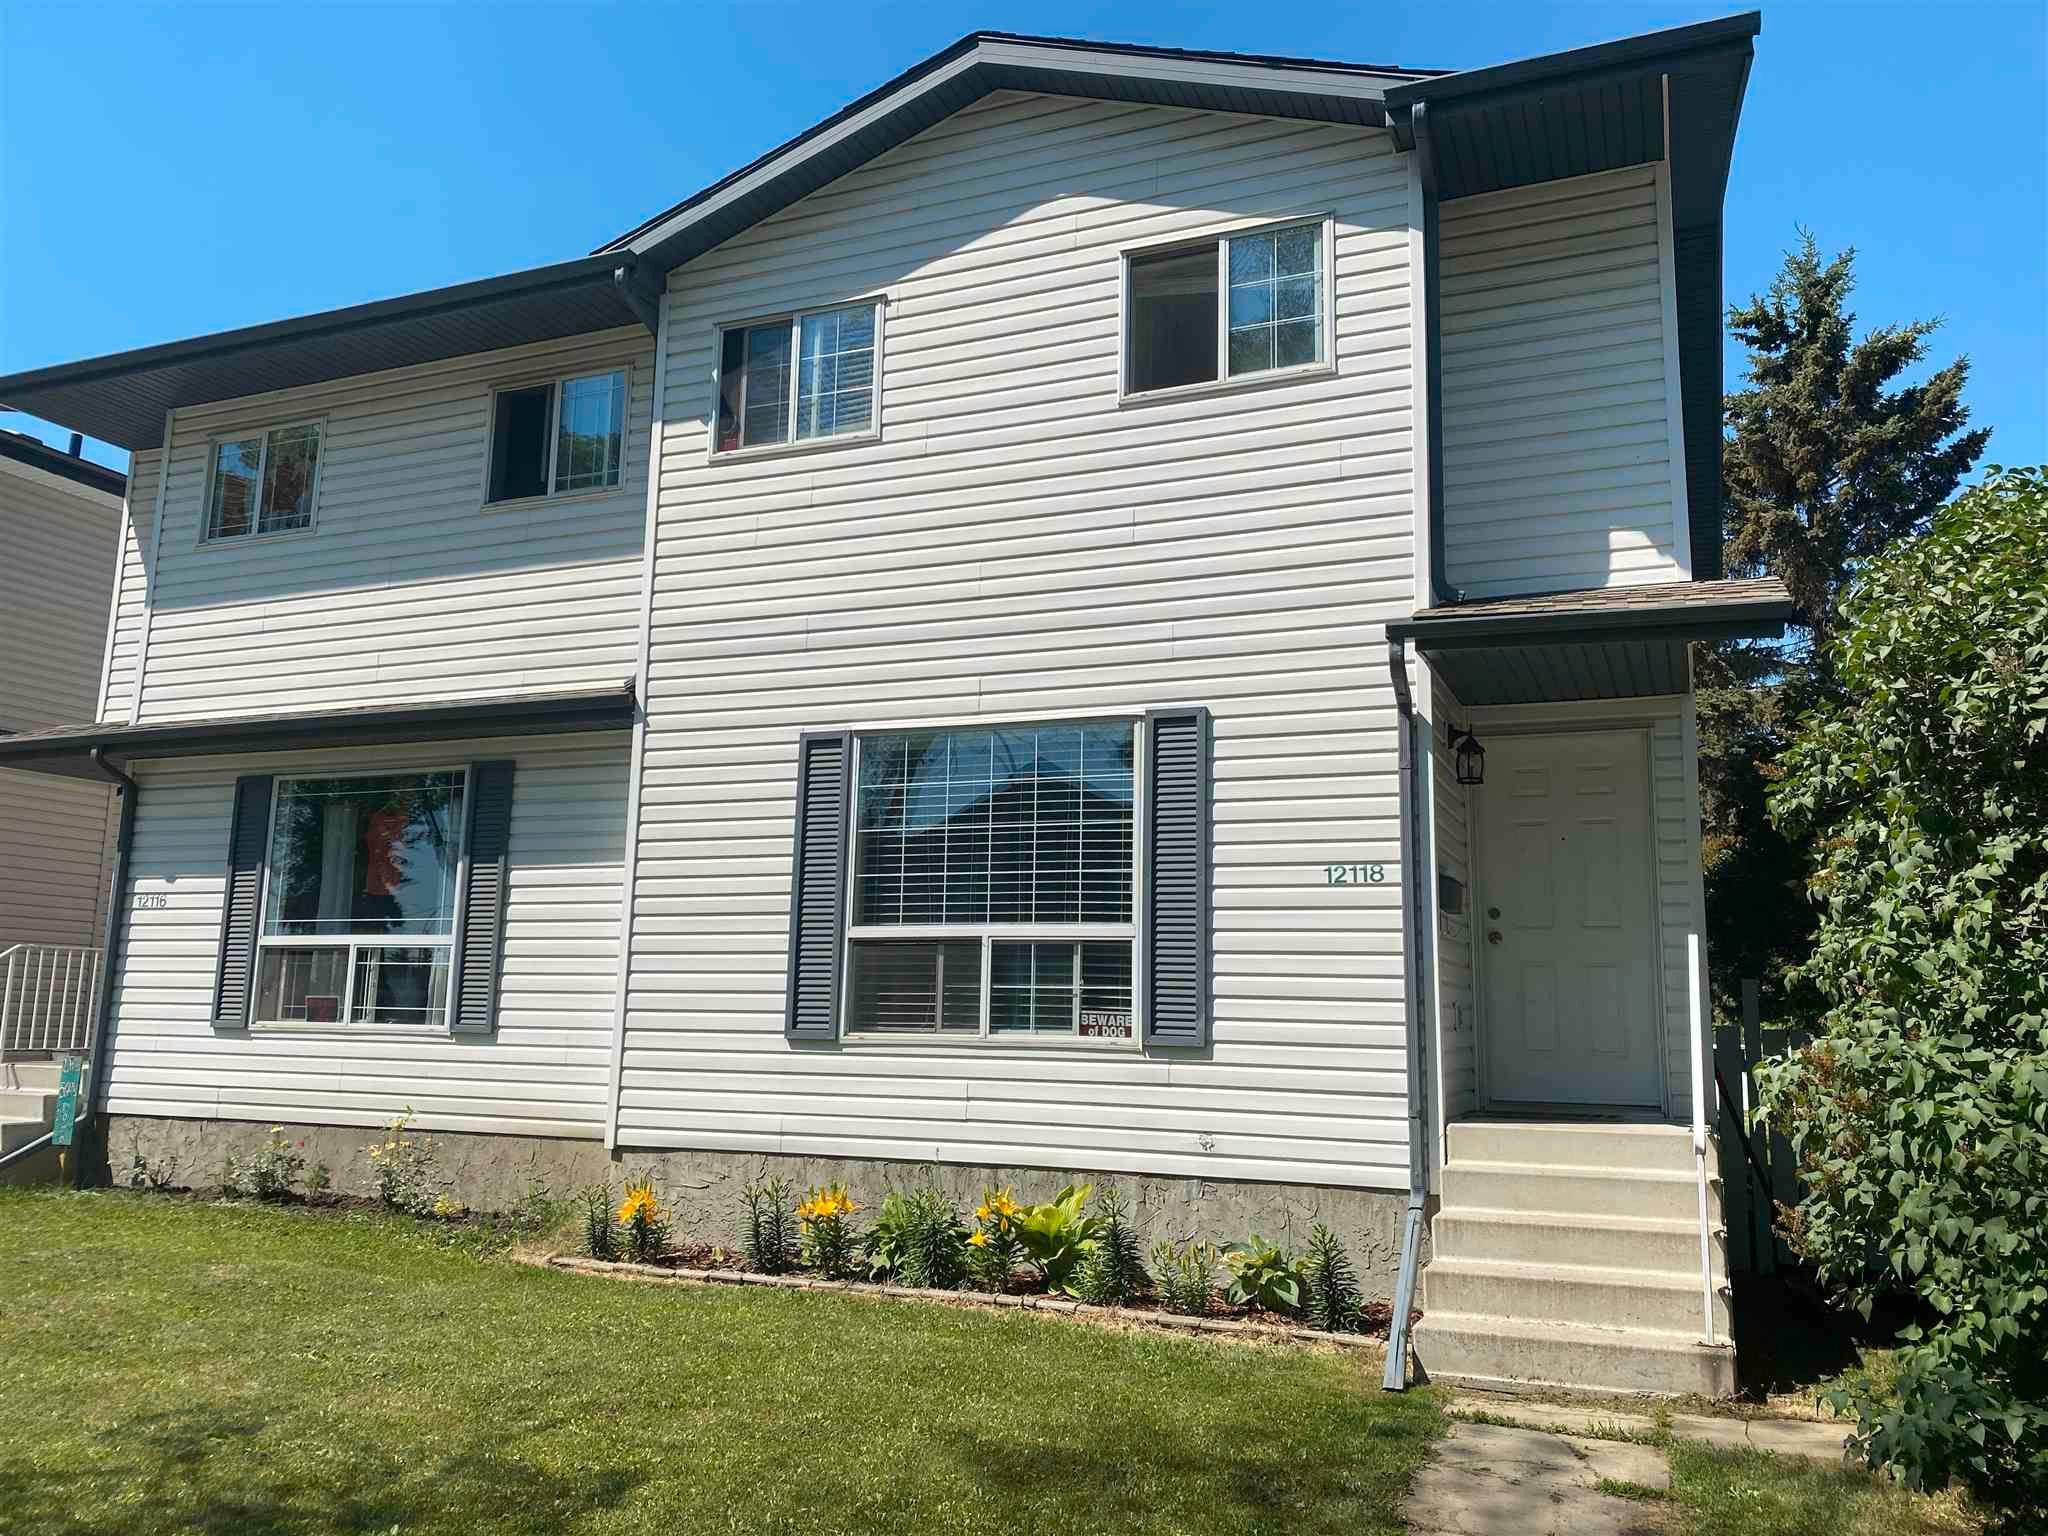 Main Photo: 12118 122 Street NW in Edmonton: Zone 04 House Half Duplex for sale : MLS®# E4257803